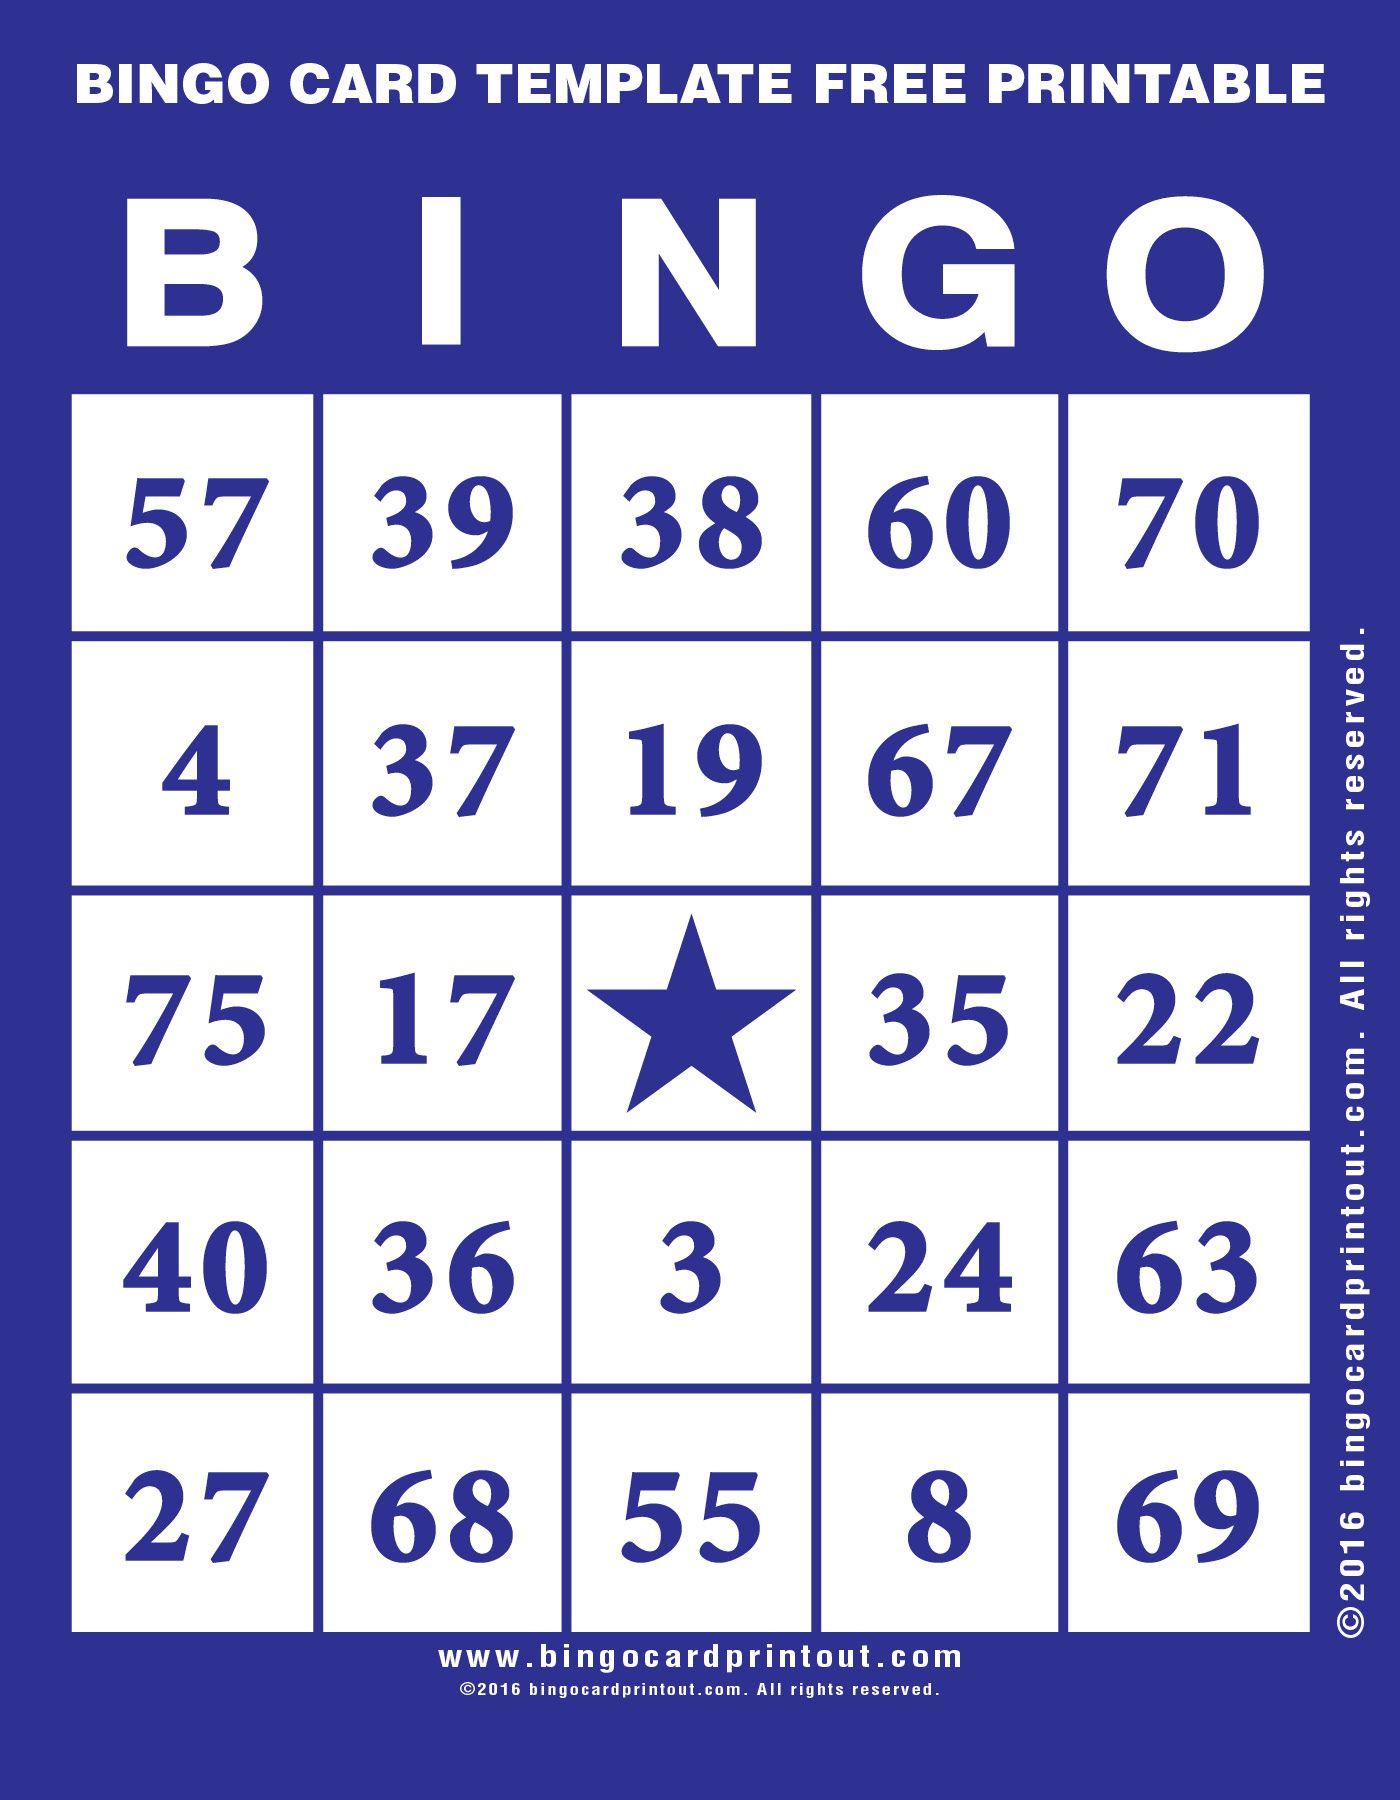 Bingo Card Template Free Printable 6   Bingo Cards Printable